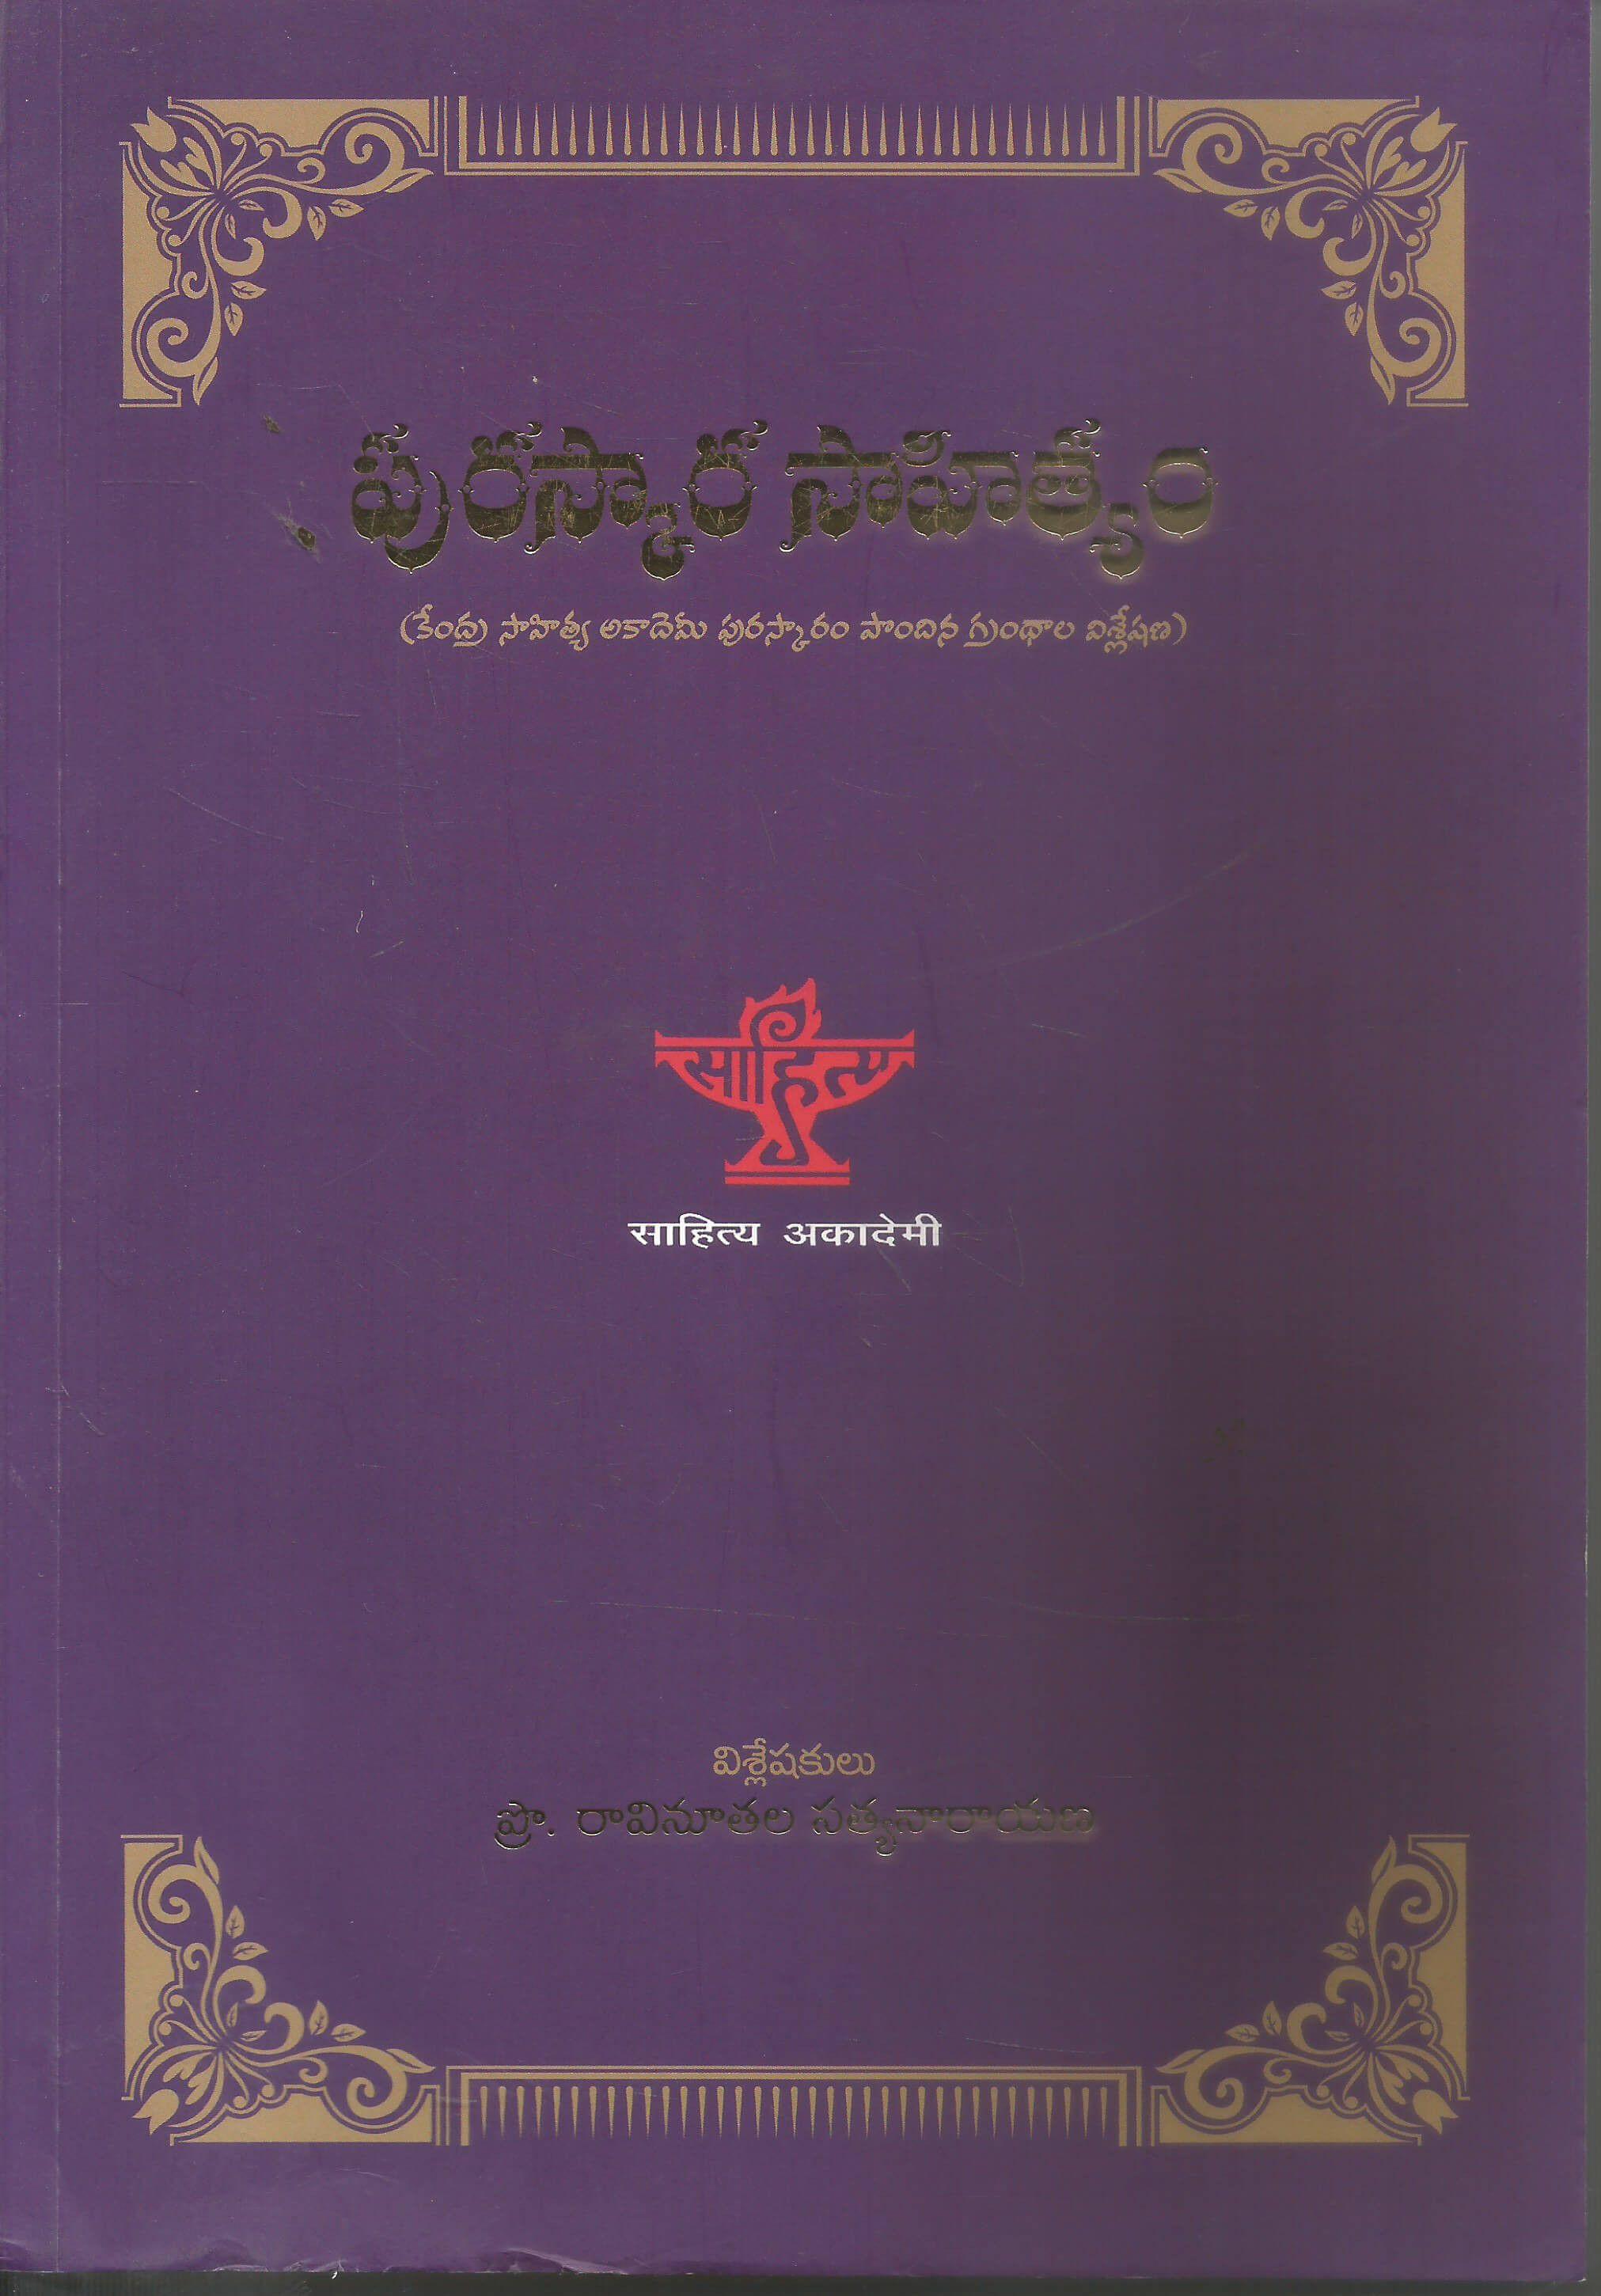 Francisco Colayco Books Epub Download